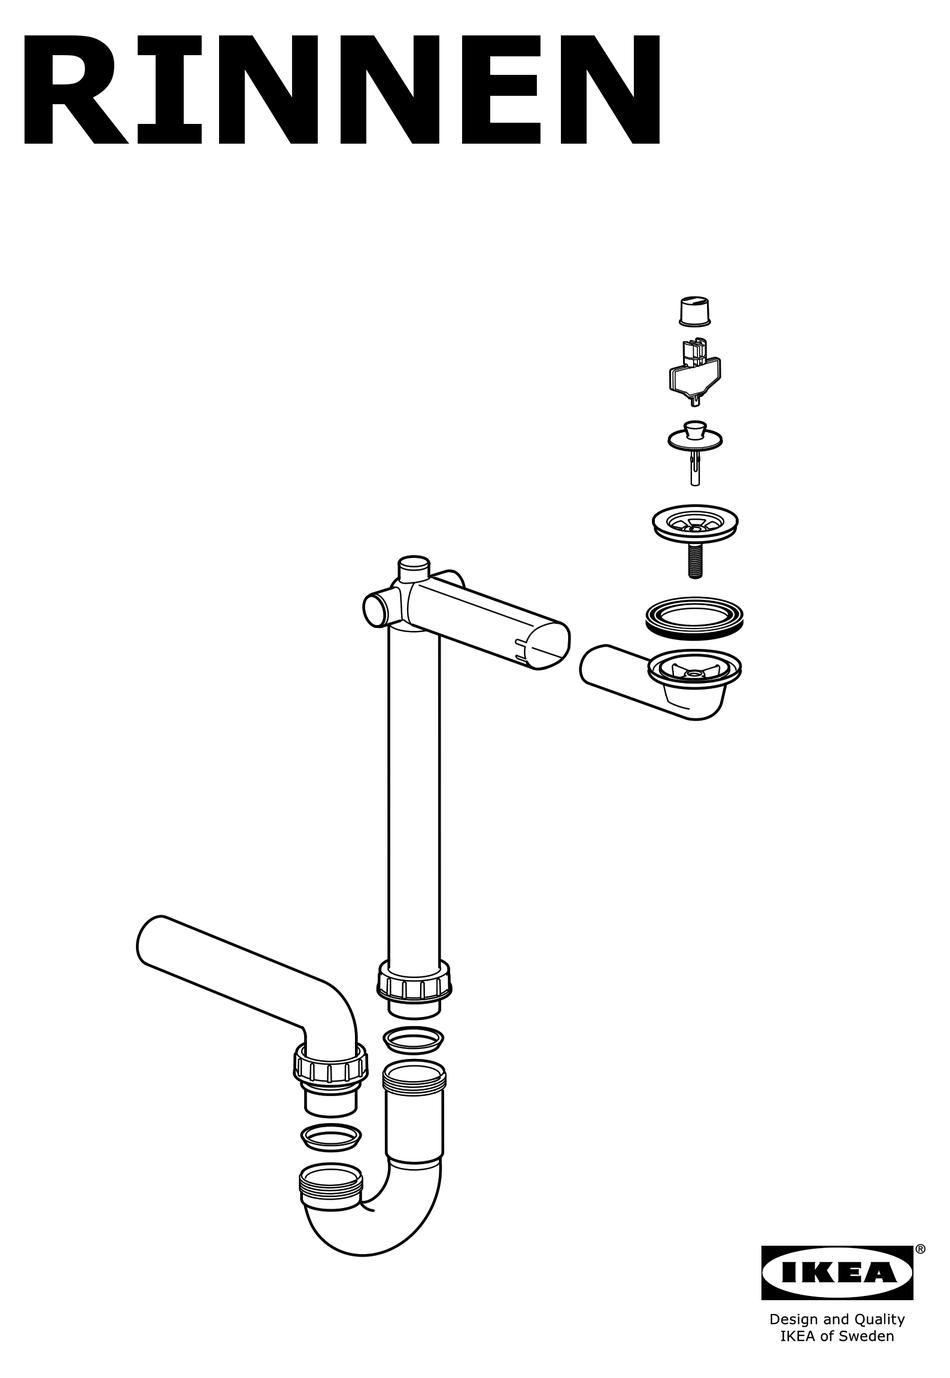 ikea rinnen installation manual pdf